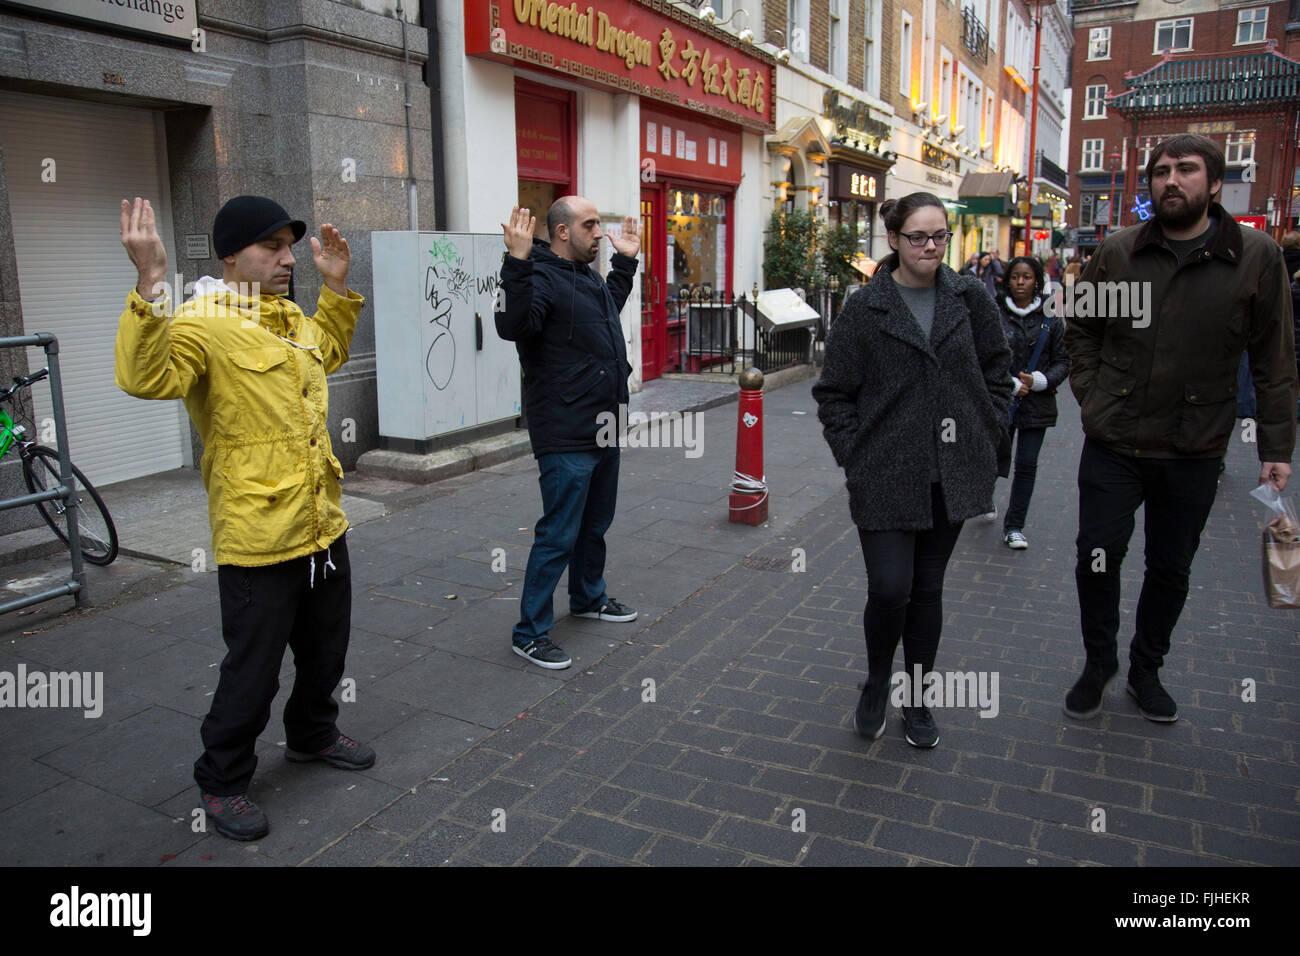 Members of Falun Gong or Falun Dafa meditating on Gerrard Street in central London, UK. Falun gong claim the following: - Stock Image